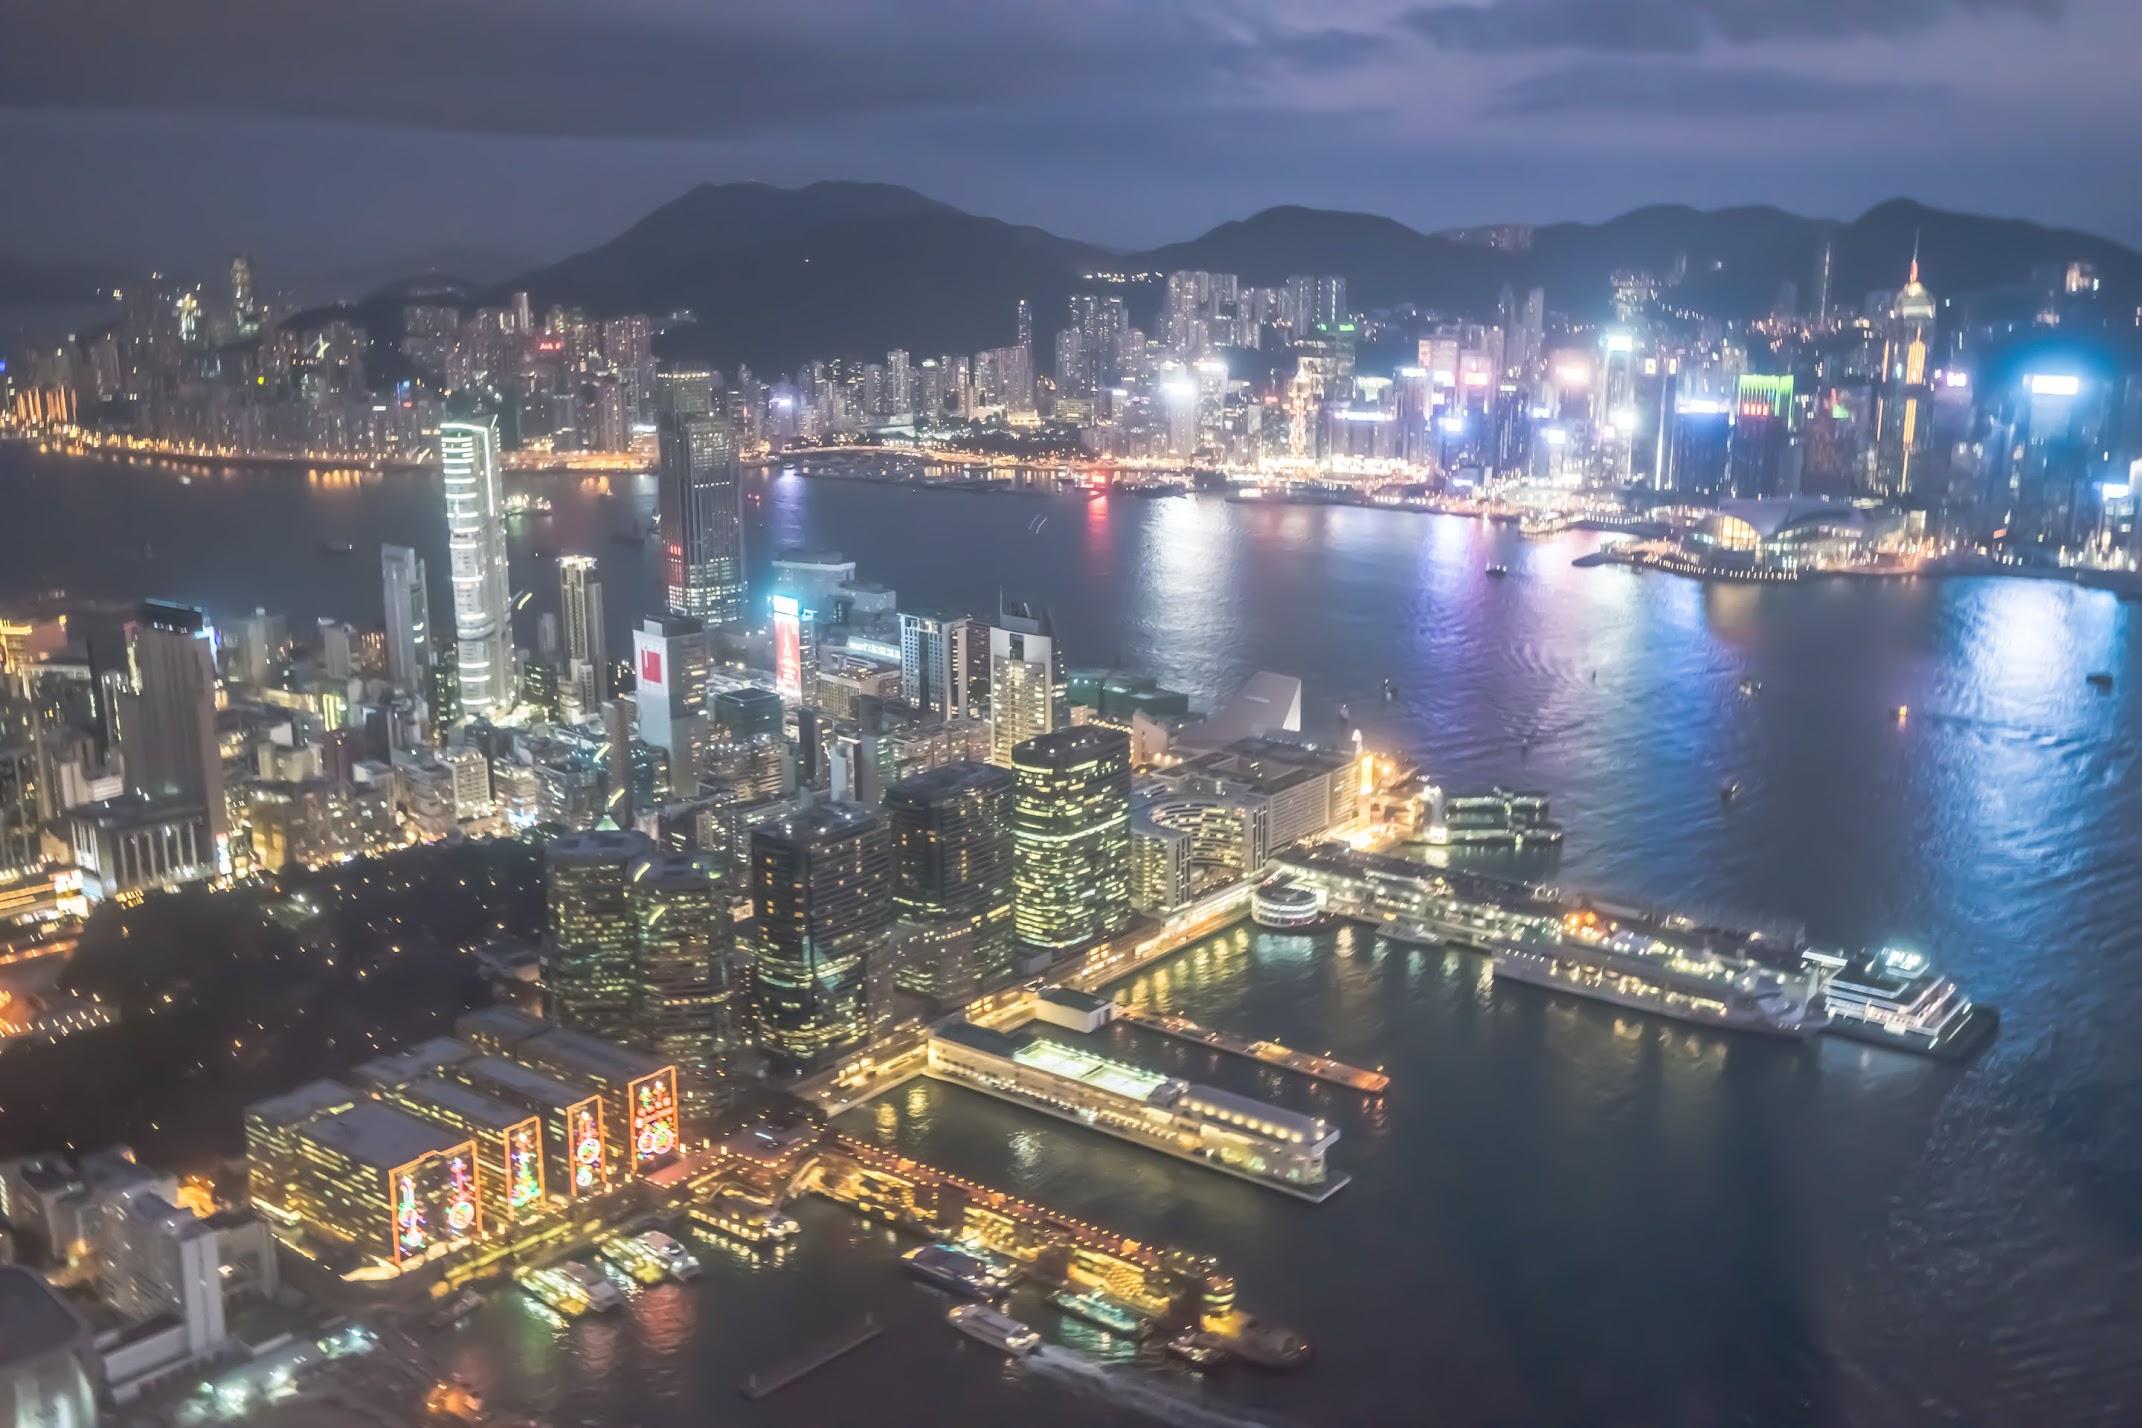 Hong Kong sky100 (天際100) night1